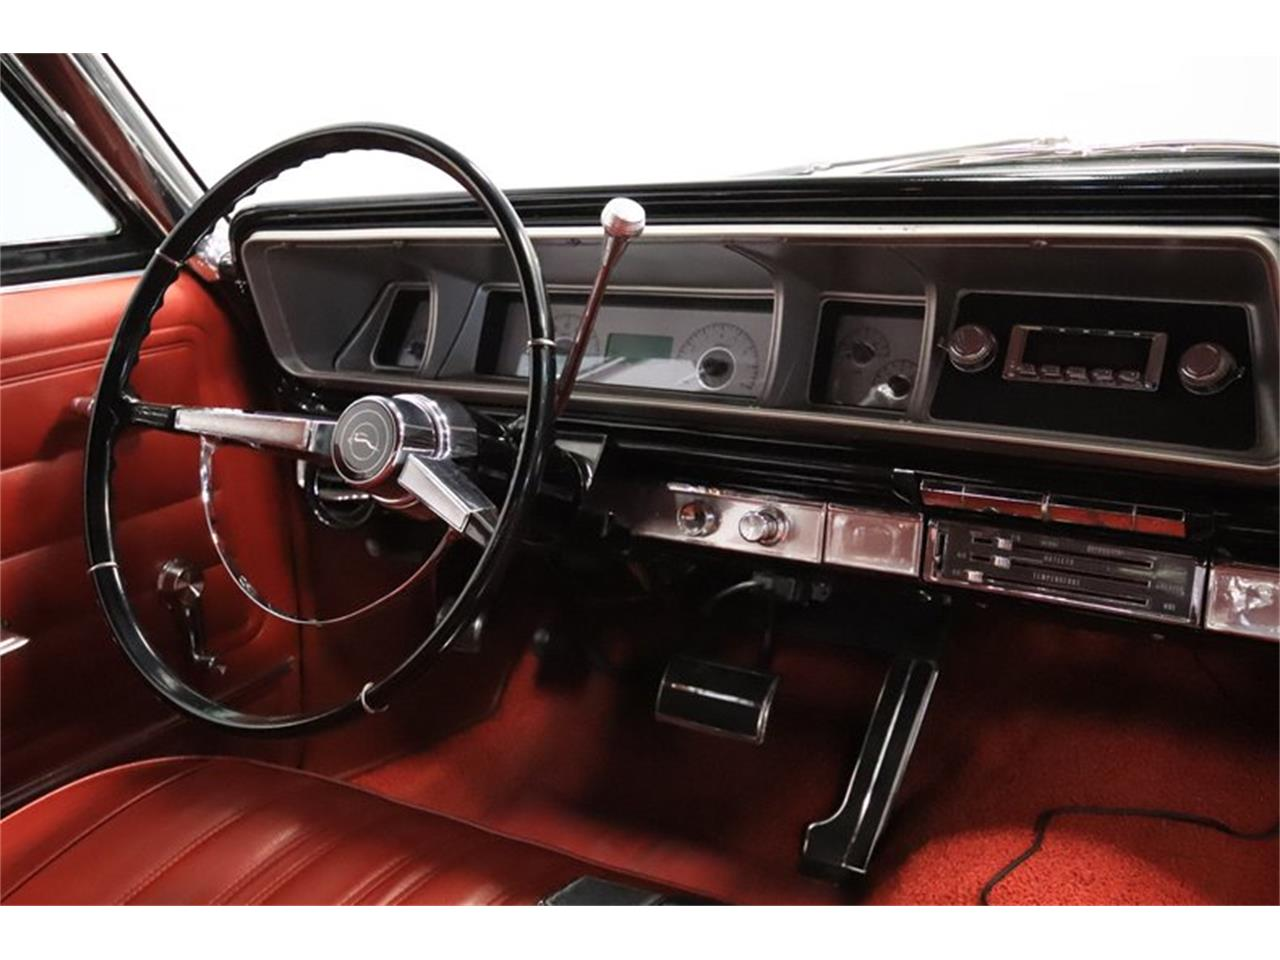 Large Picture of '66 Chevrolet Impala located in Mesa Arizona - $52,995.00 - Q2EF